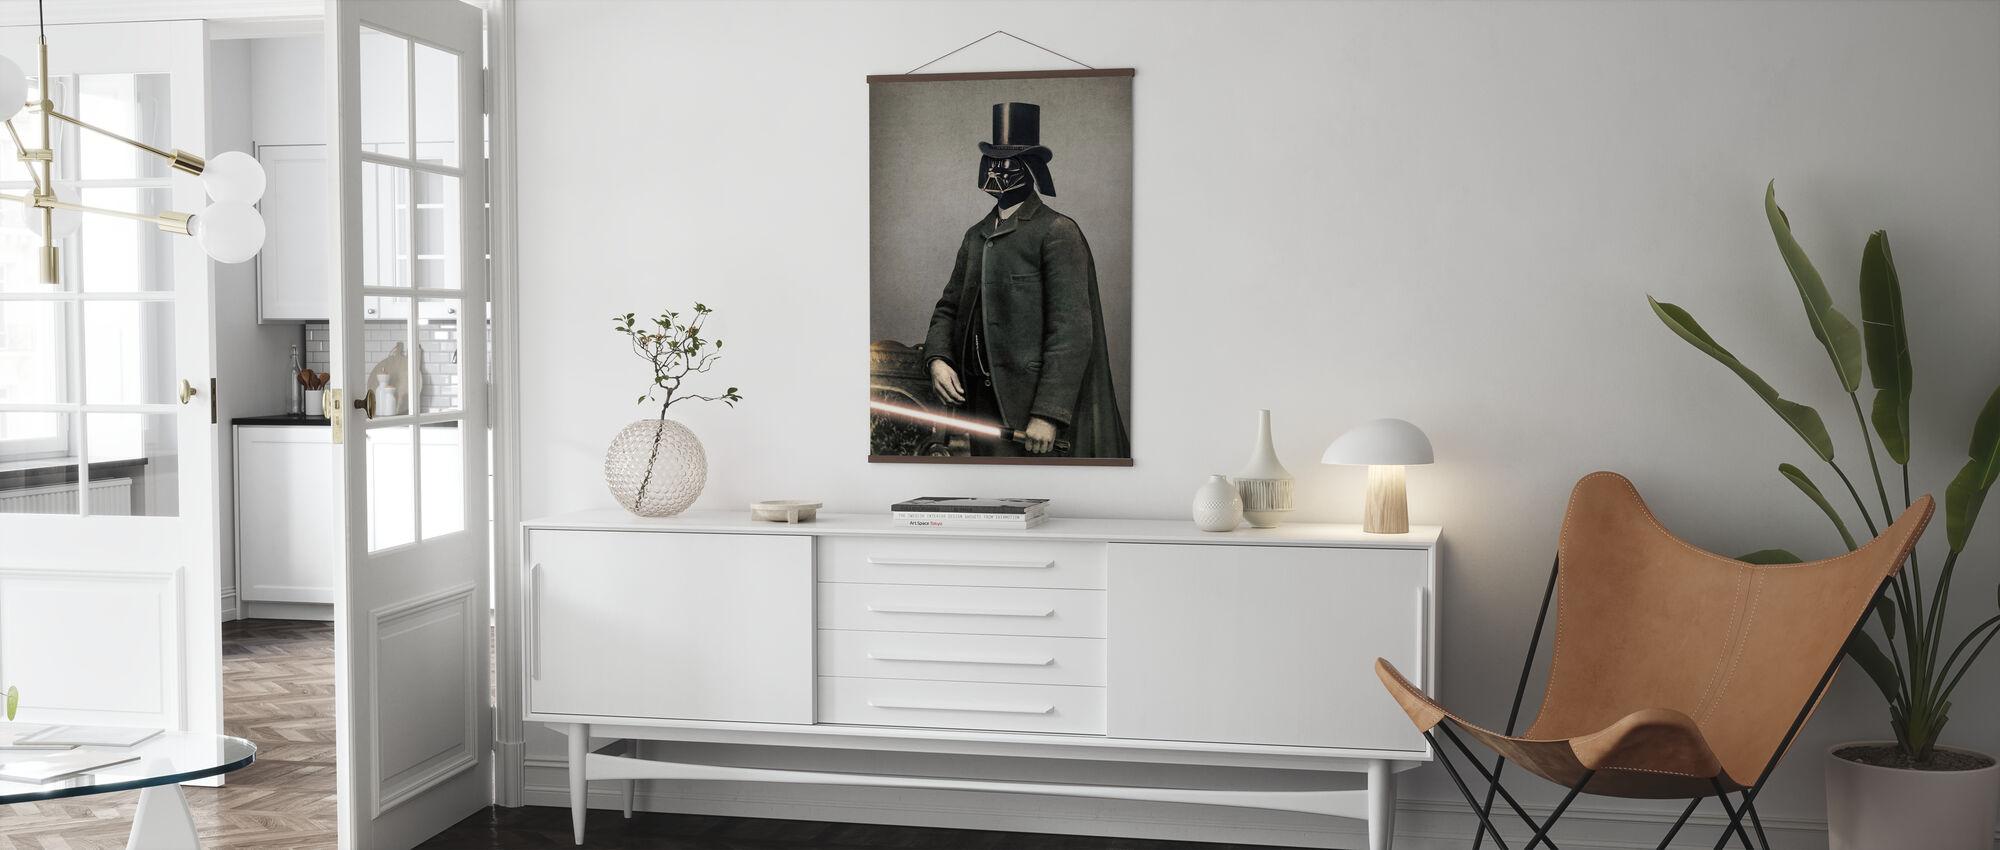 Guerre vittoriane Lord Vadersworth - Poster - Salotto